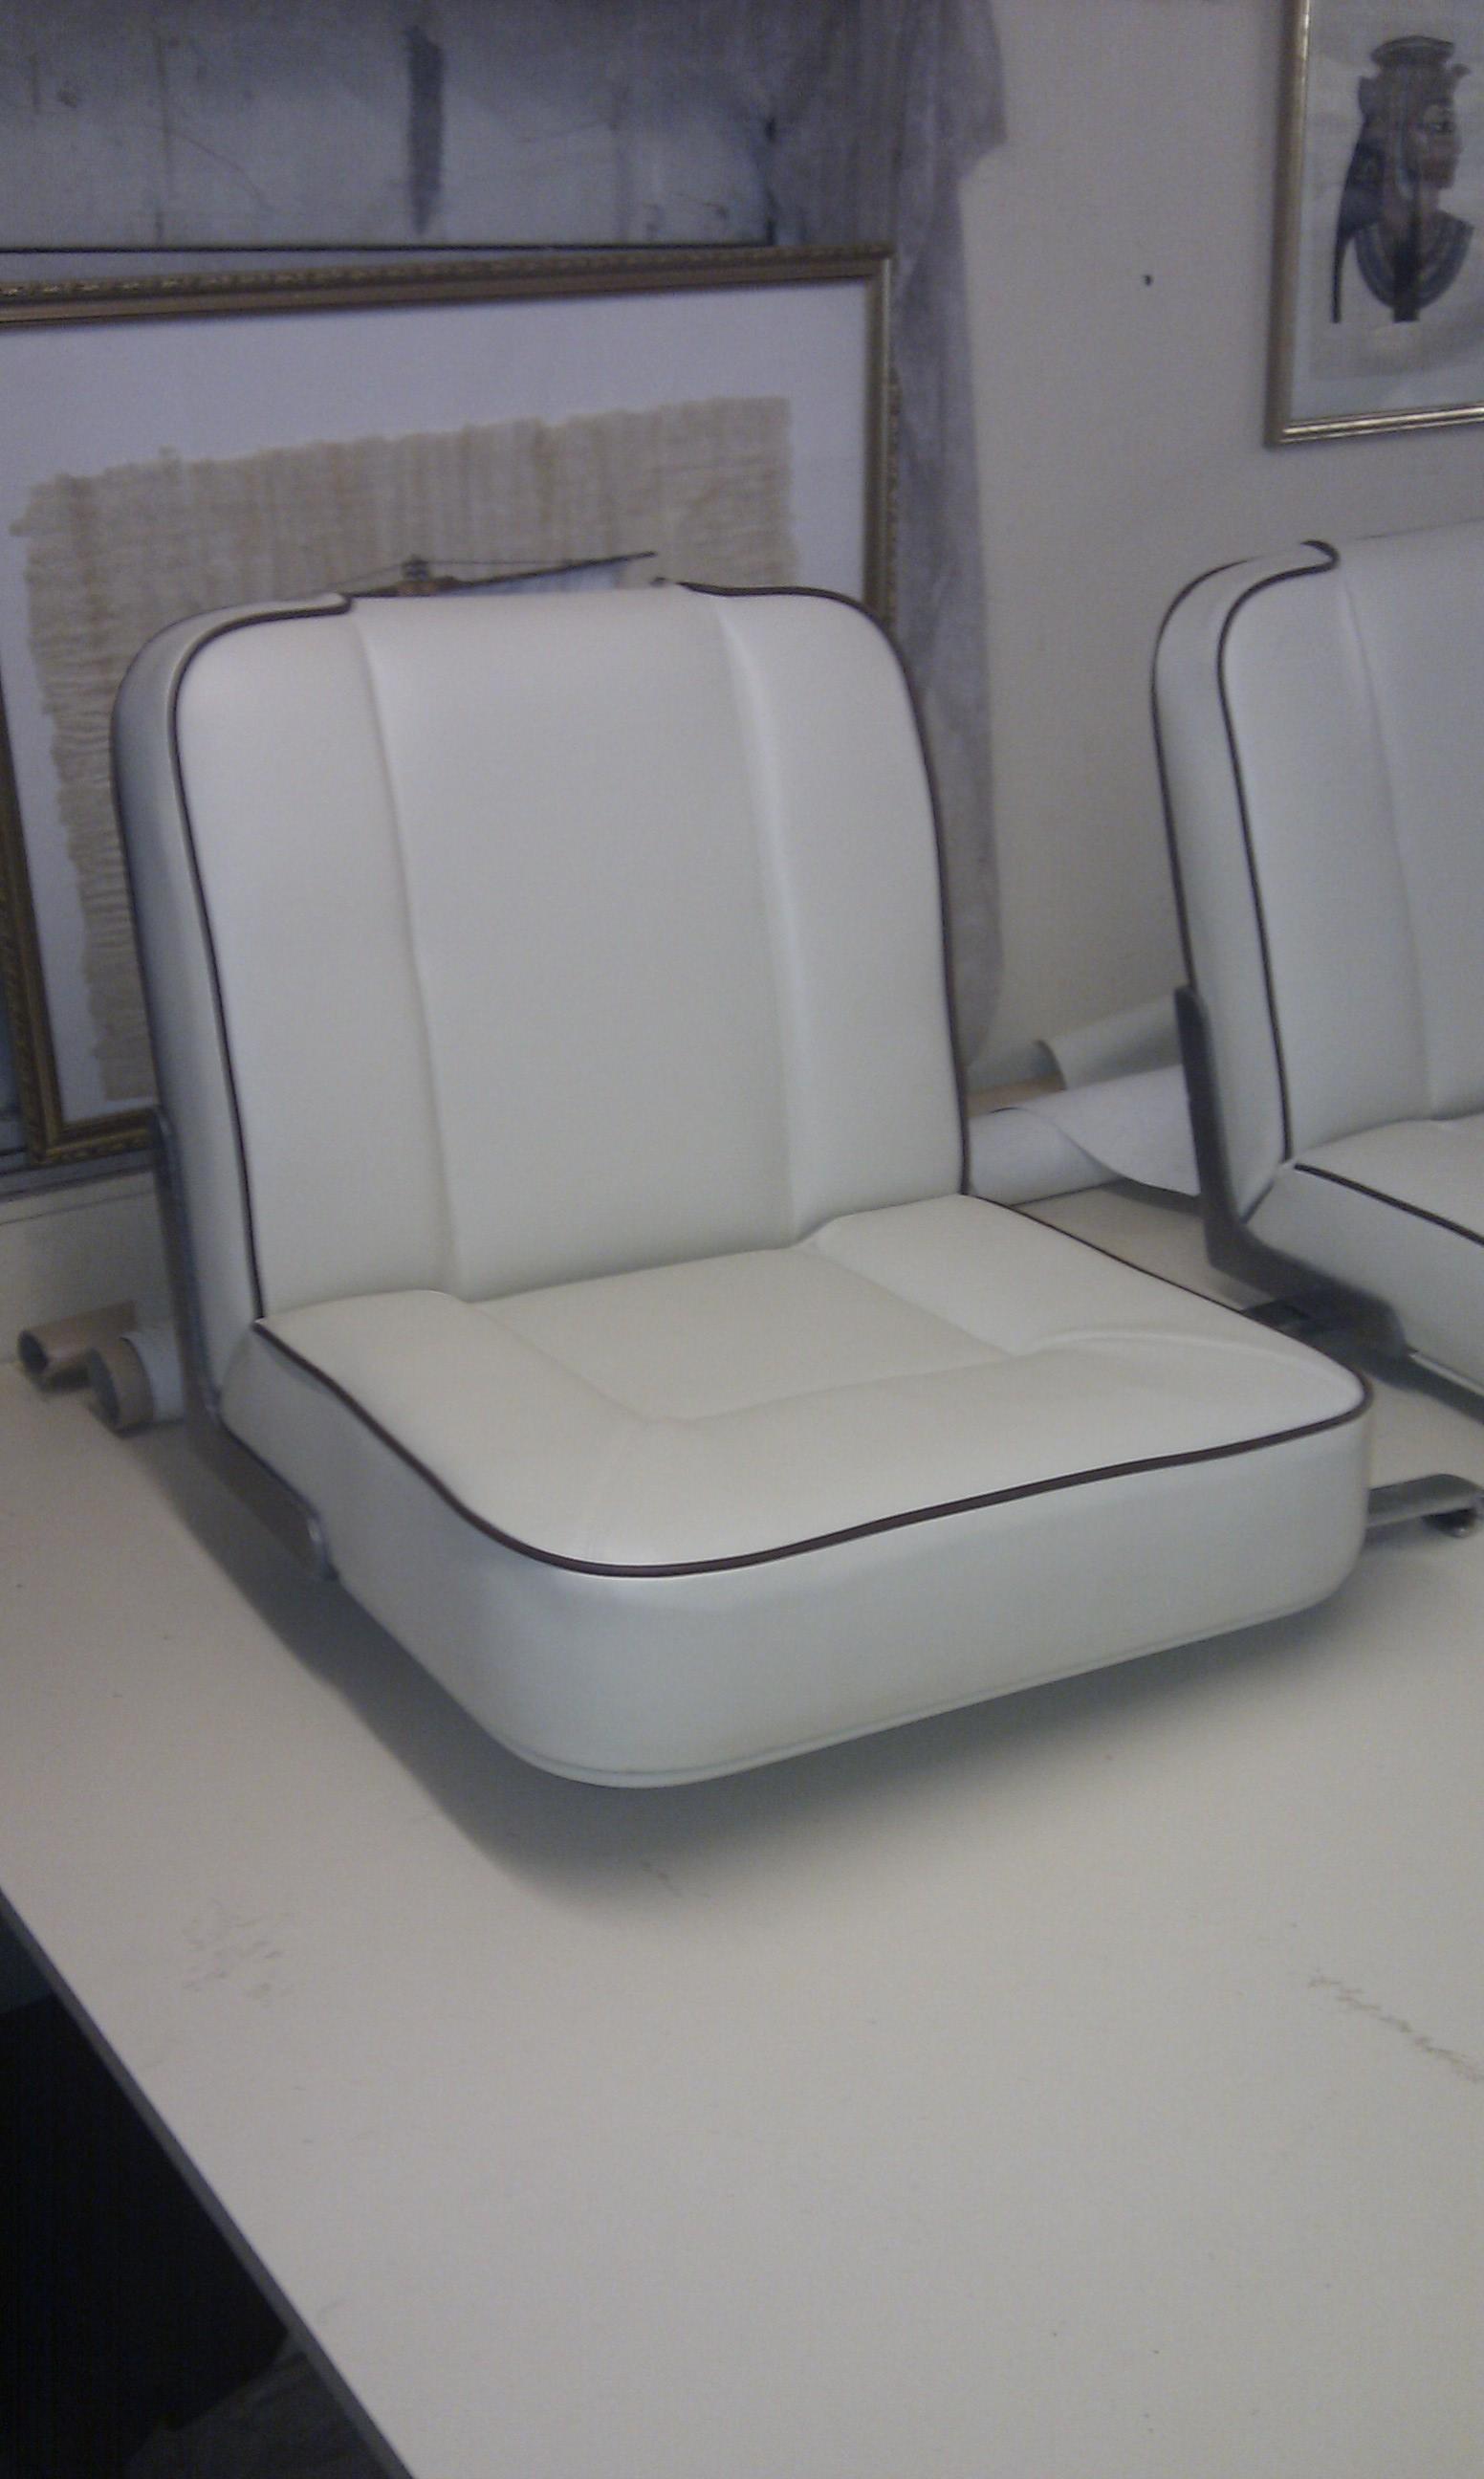 Helmmans Seat.jpg